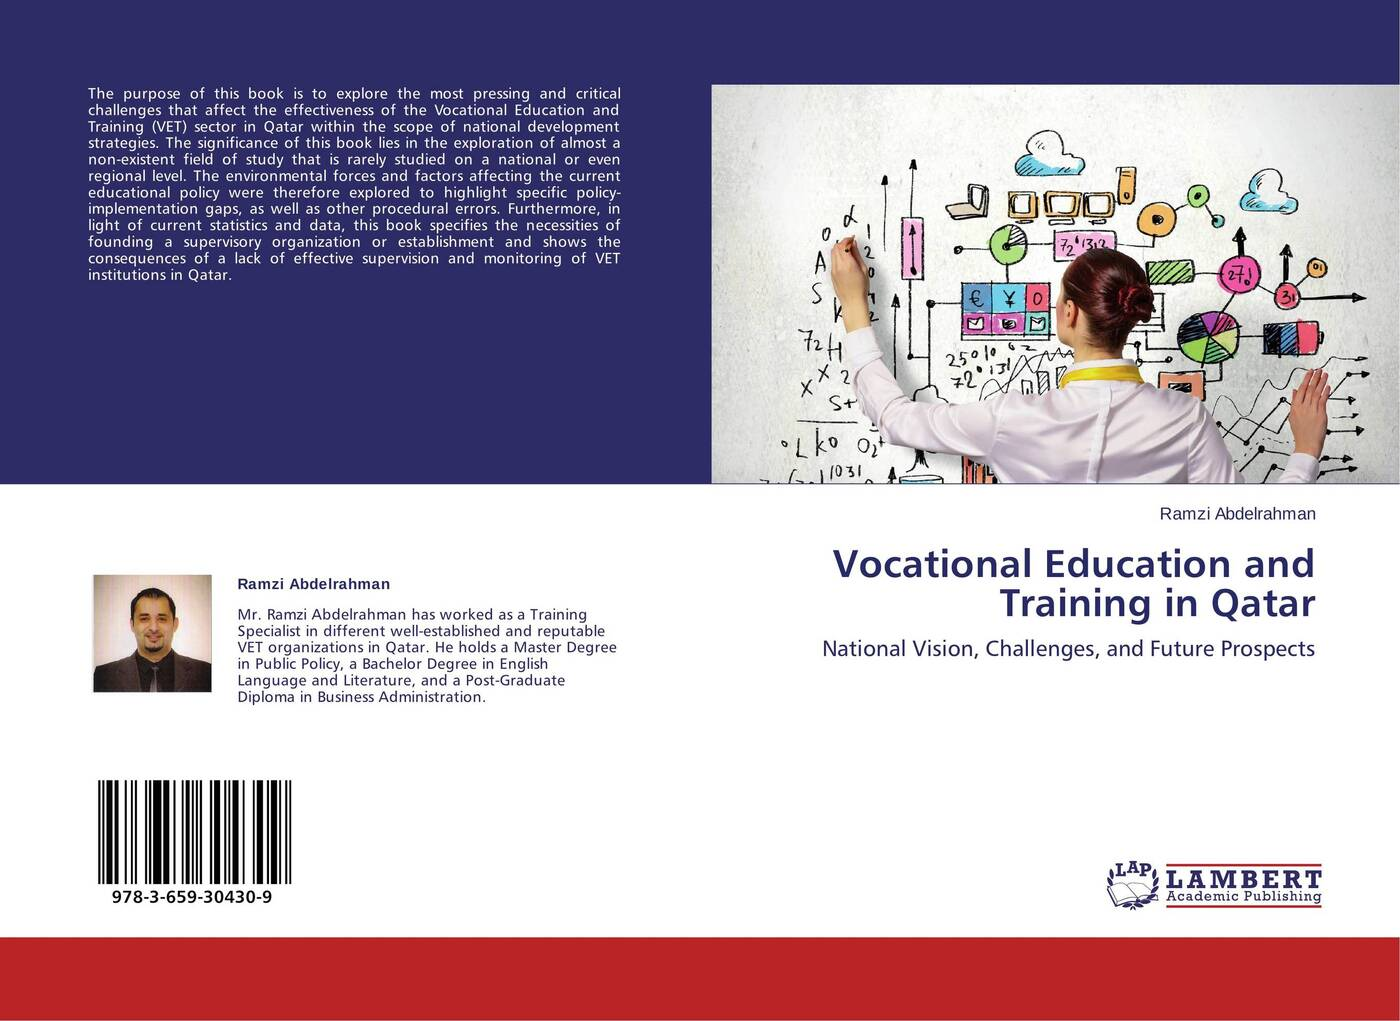 Ramzi Abdelrahman Vocational Education and Training in Qatar furniture qatar